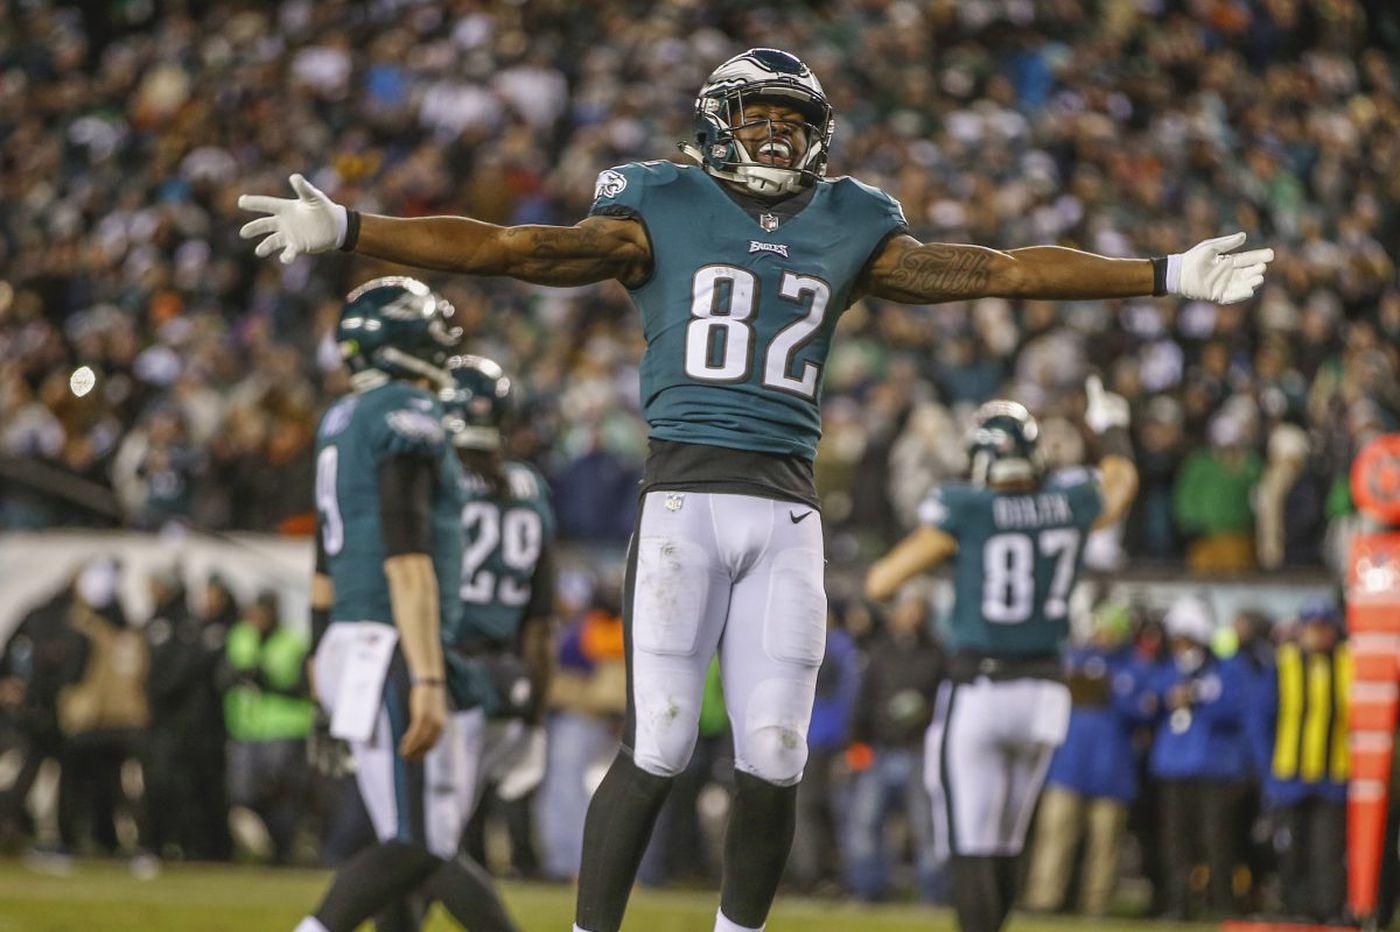 Eagles' road to Super Bowl 2018: Howie Roseman's stellar offseason